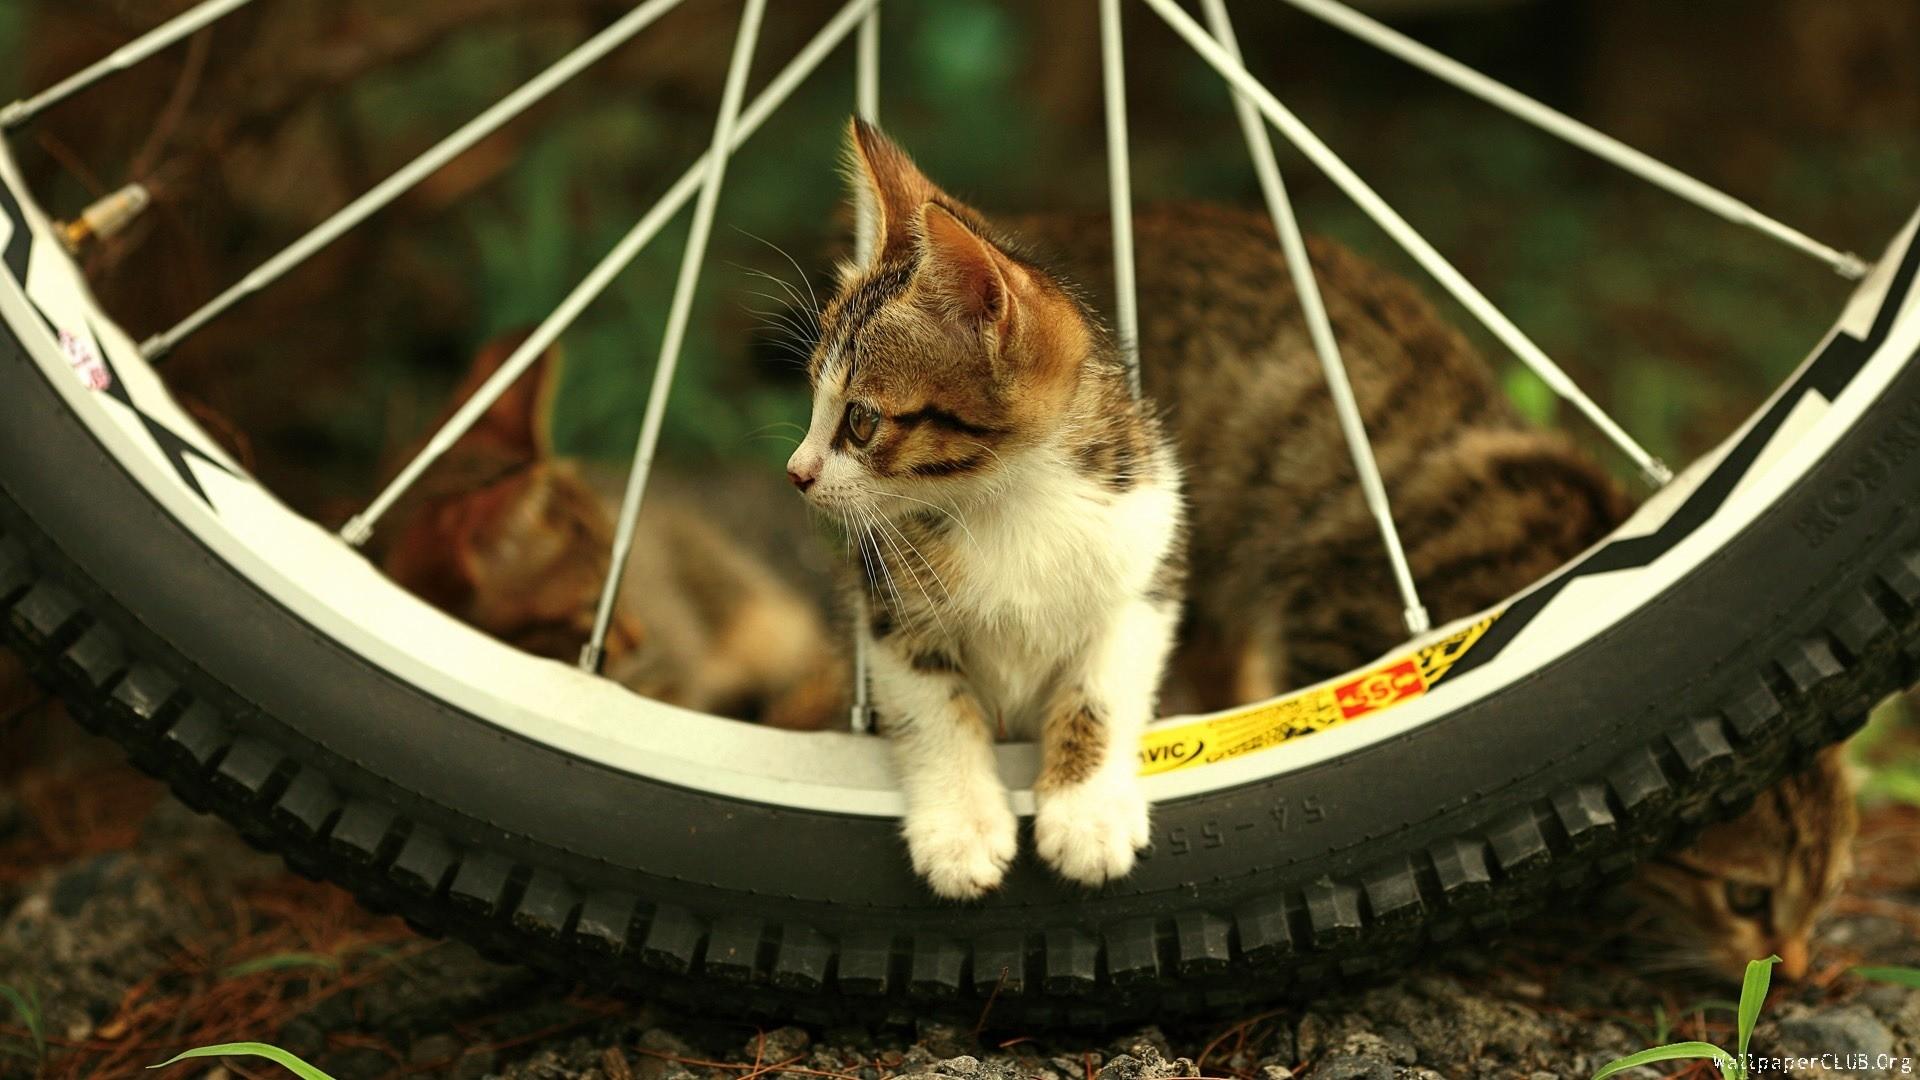 Kitty Cat Desktop Wallpaper 64 Images